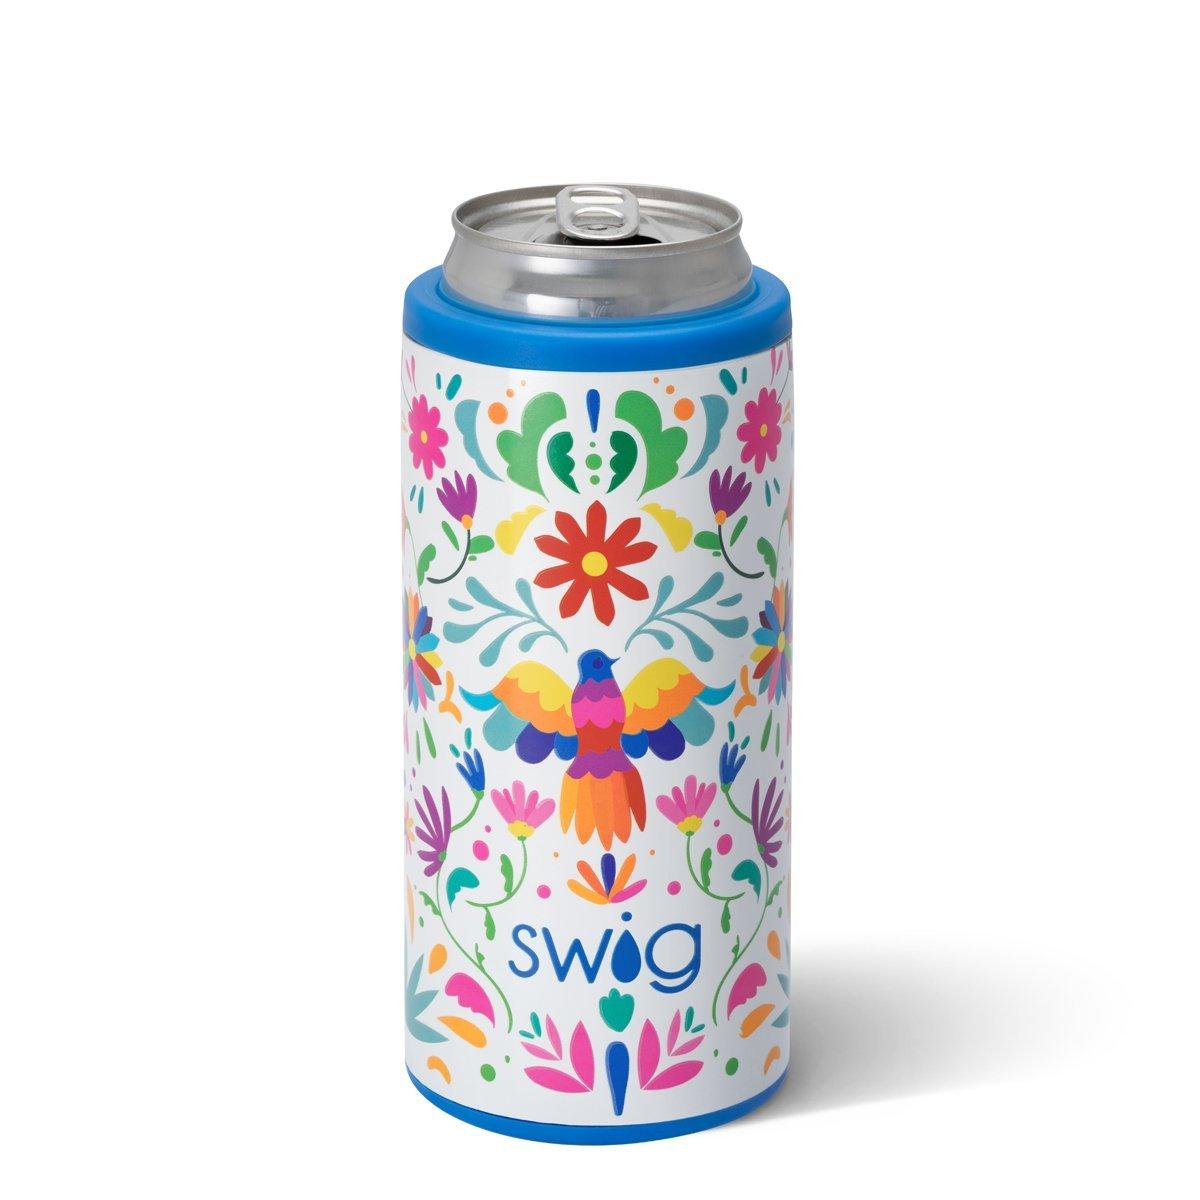 Fiesta Swig Skinny Can Cooler